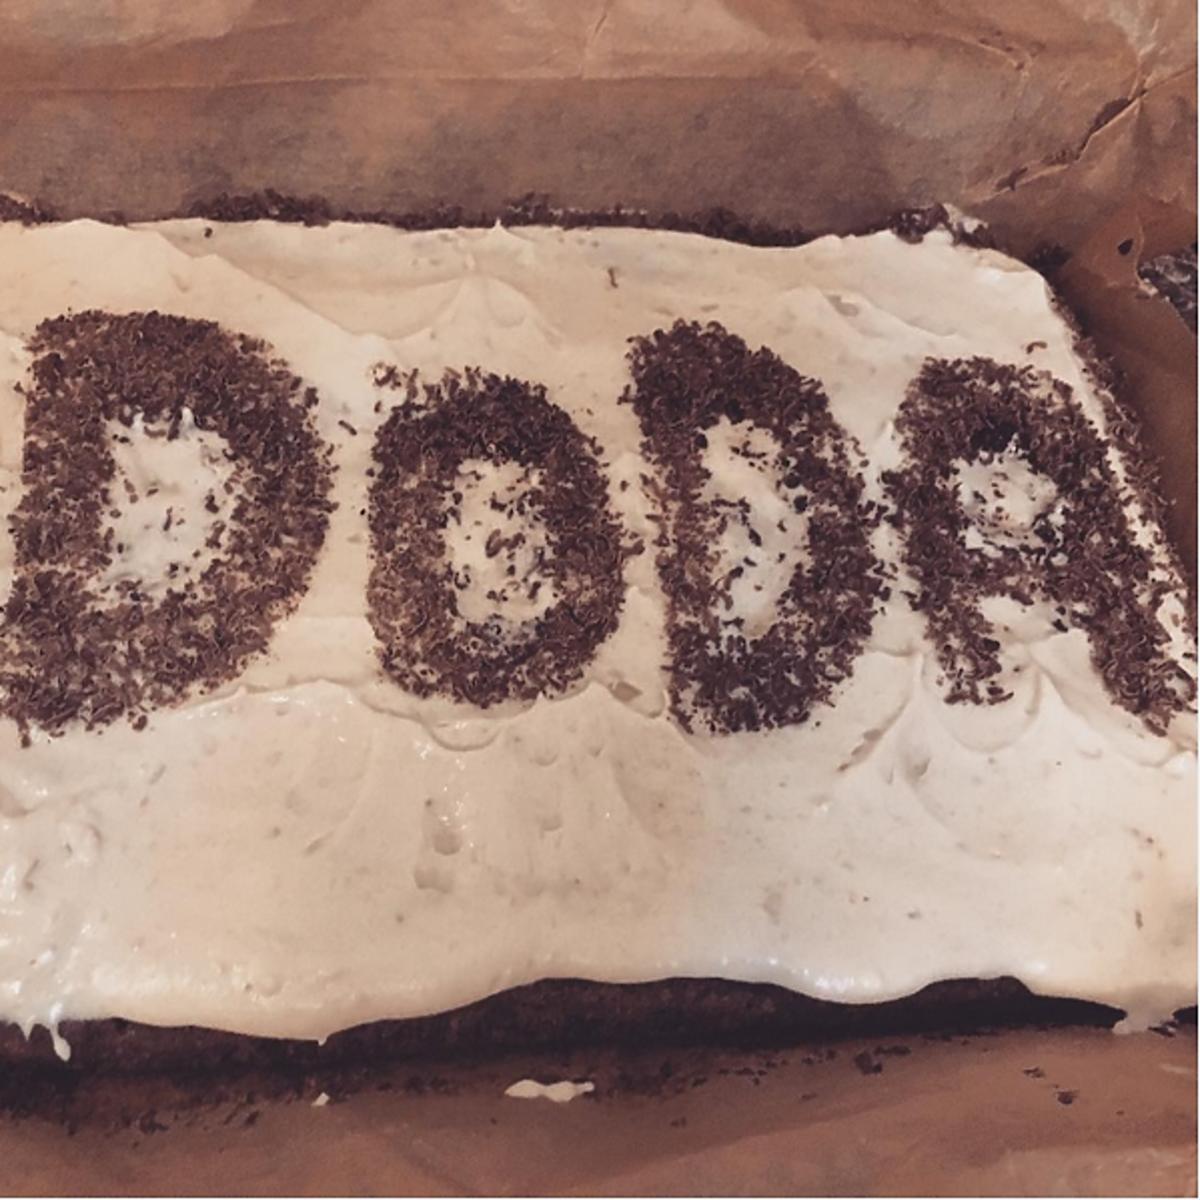 Doda upiekła bezglutenowe ciasto